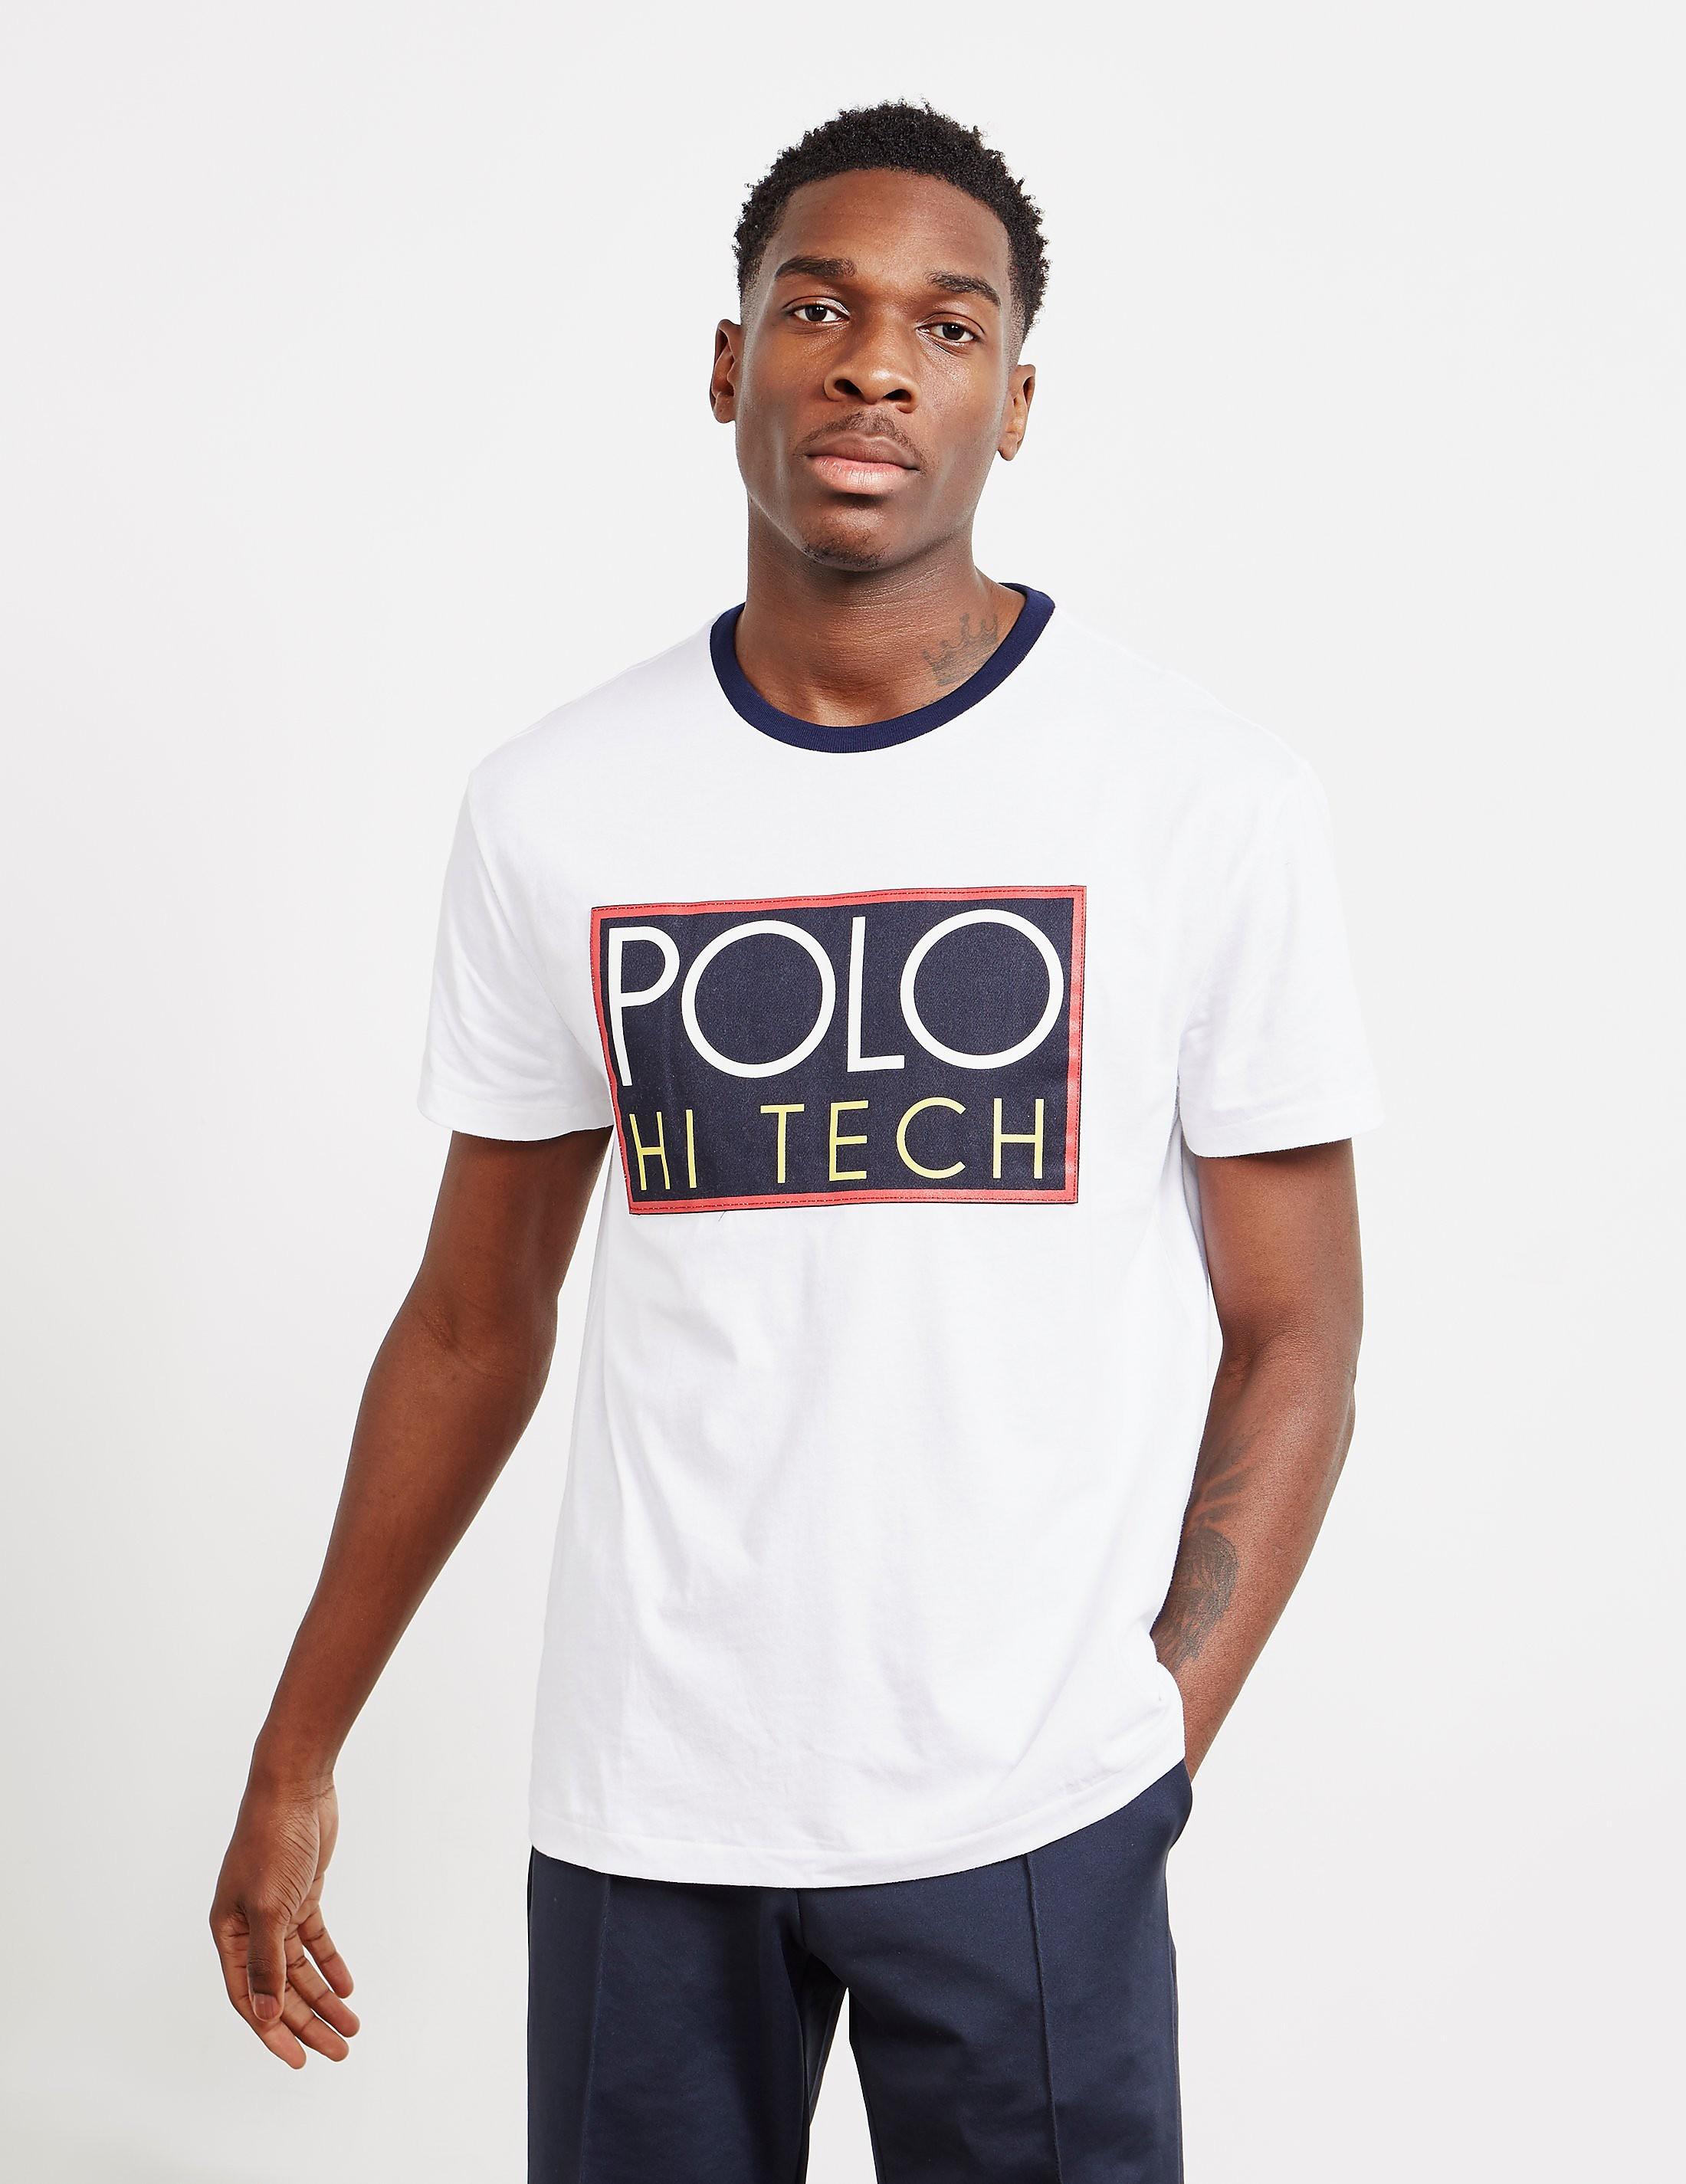 e764925cf5e Mens Polo Ralph Lauren Hi Tech Short Sleeve T-Shirt White, White ...